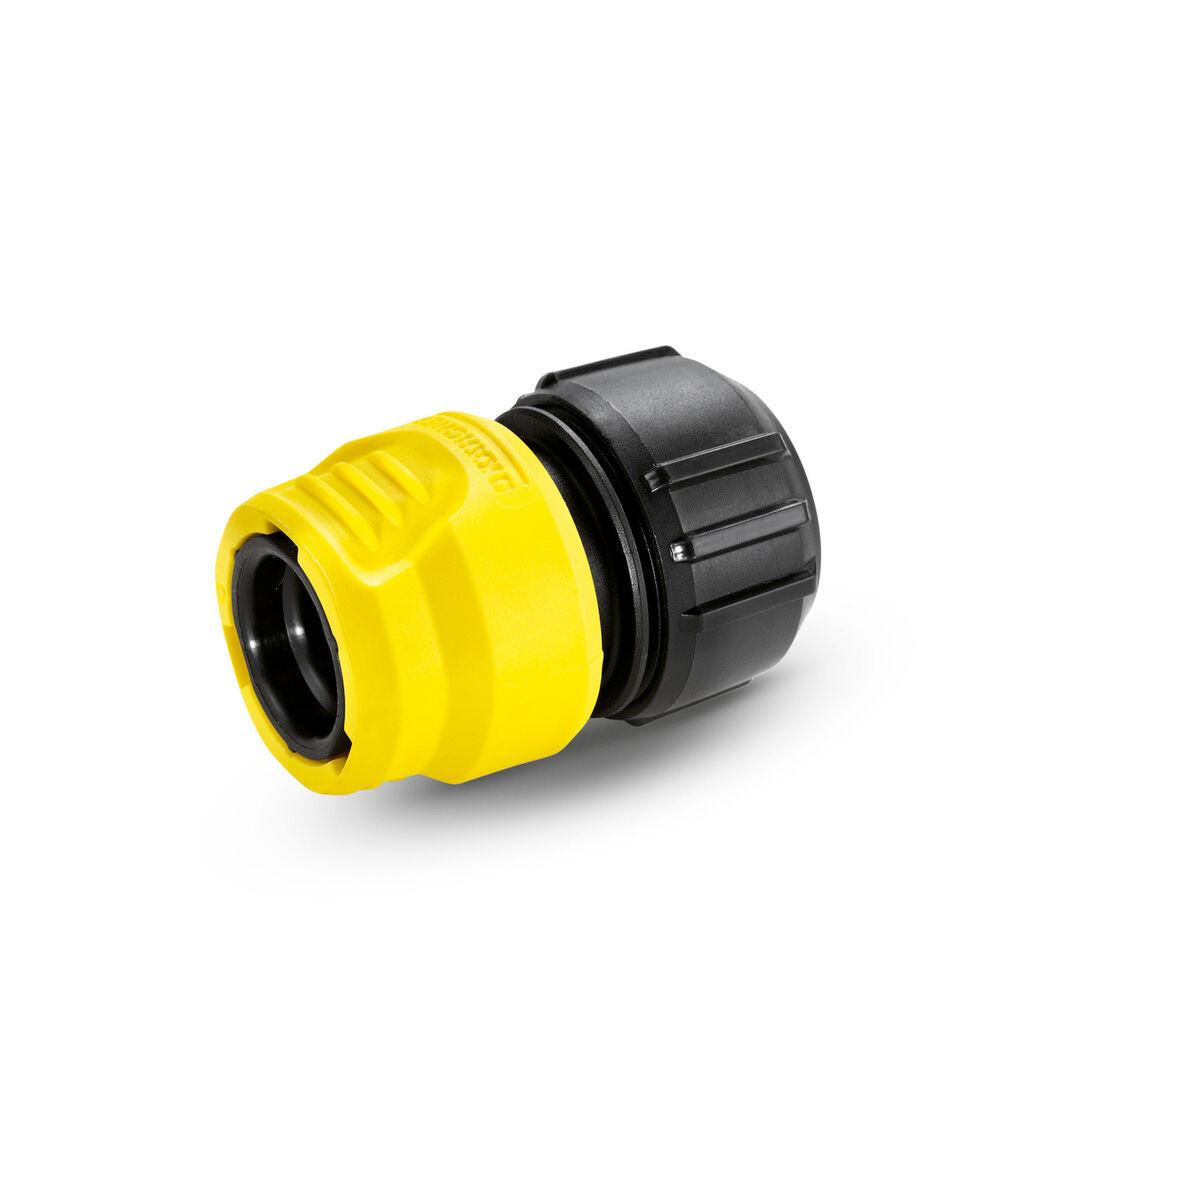 KARCHER Raccord Universel Aquastop 13-15-19mm - KARCHER - 2.645-202.0